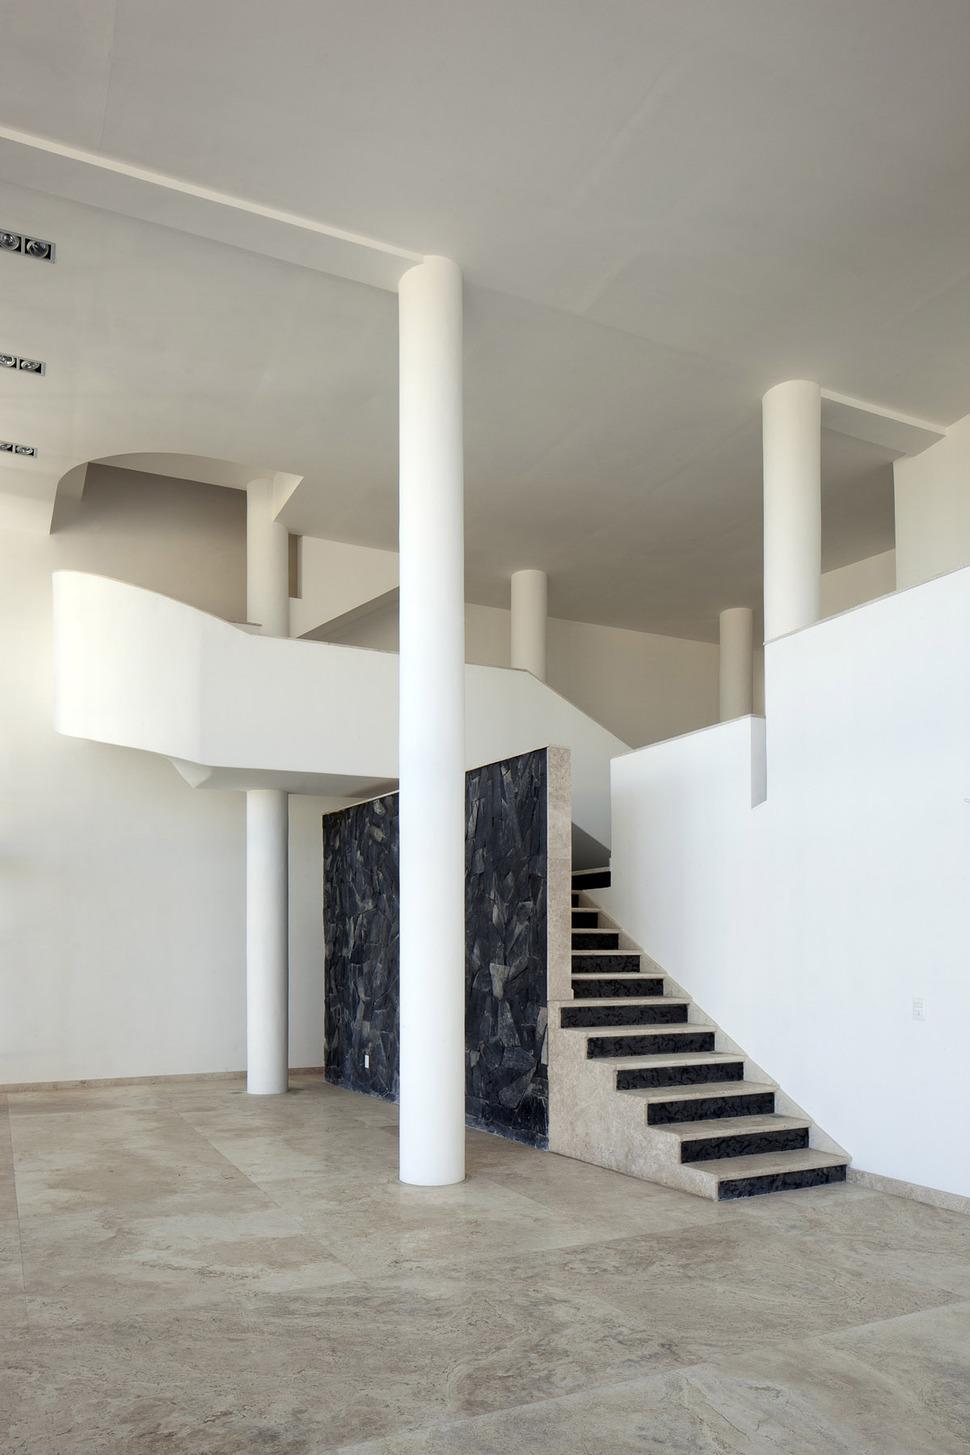 Modern Hacienda Style Home Built on Pillars